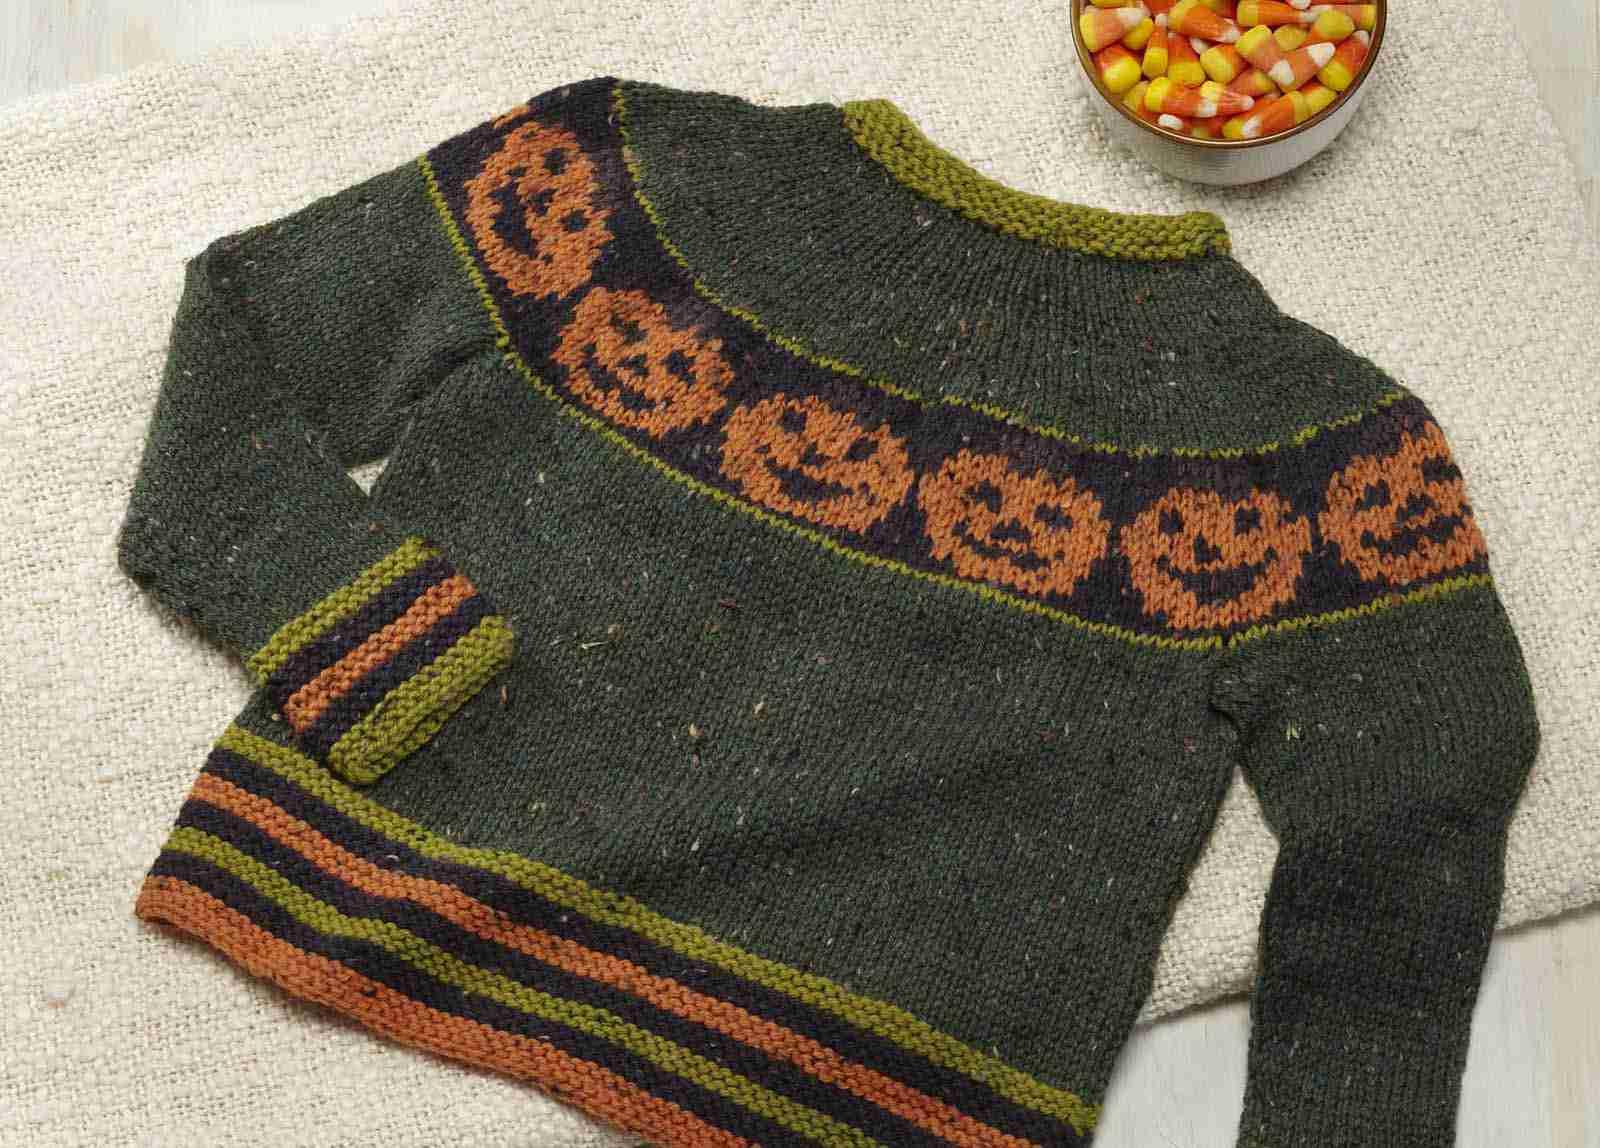 18 Free Pumpkin Patterns for Knitting